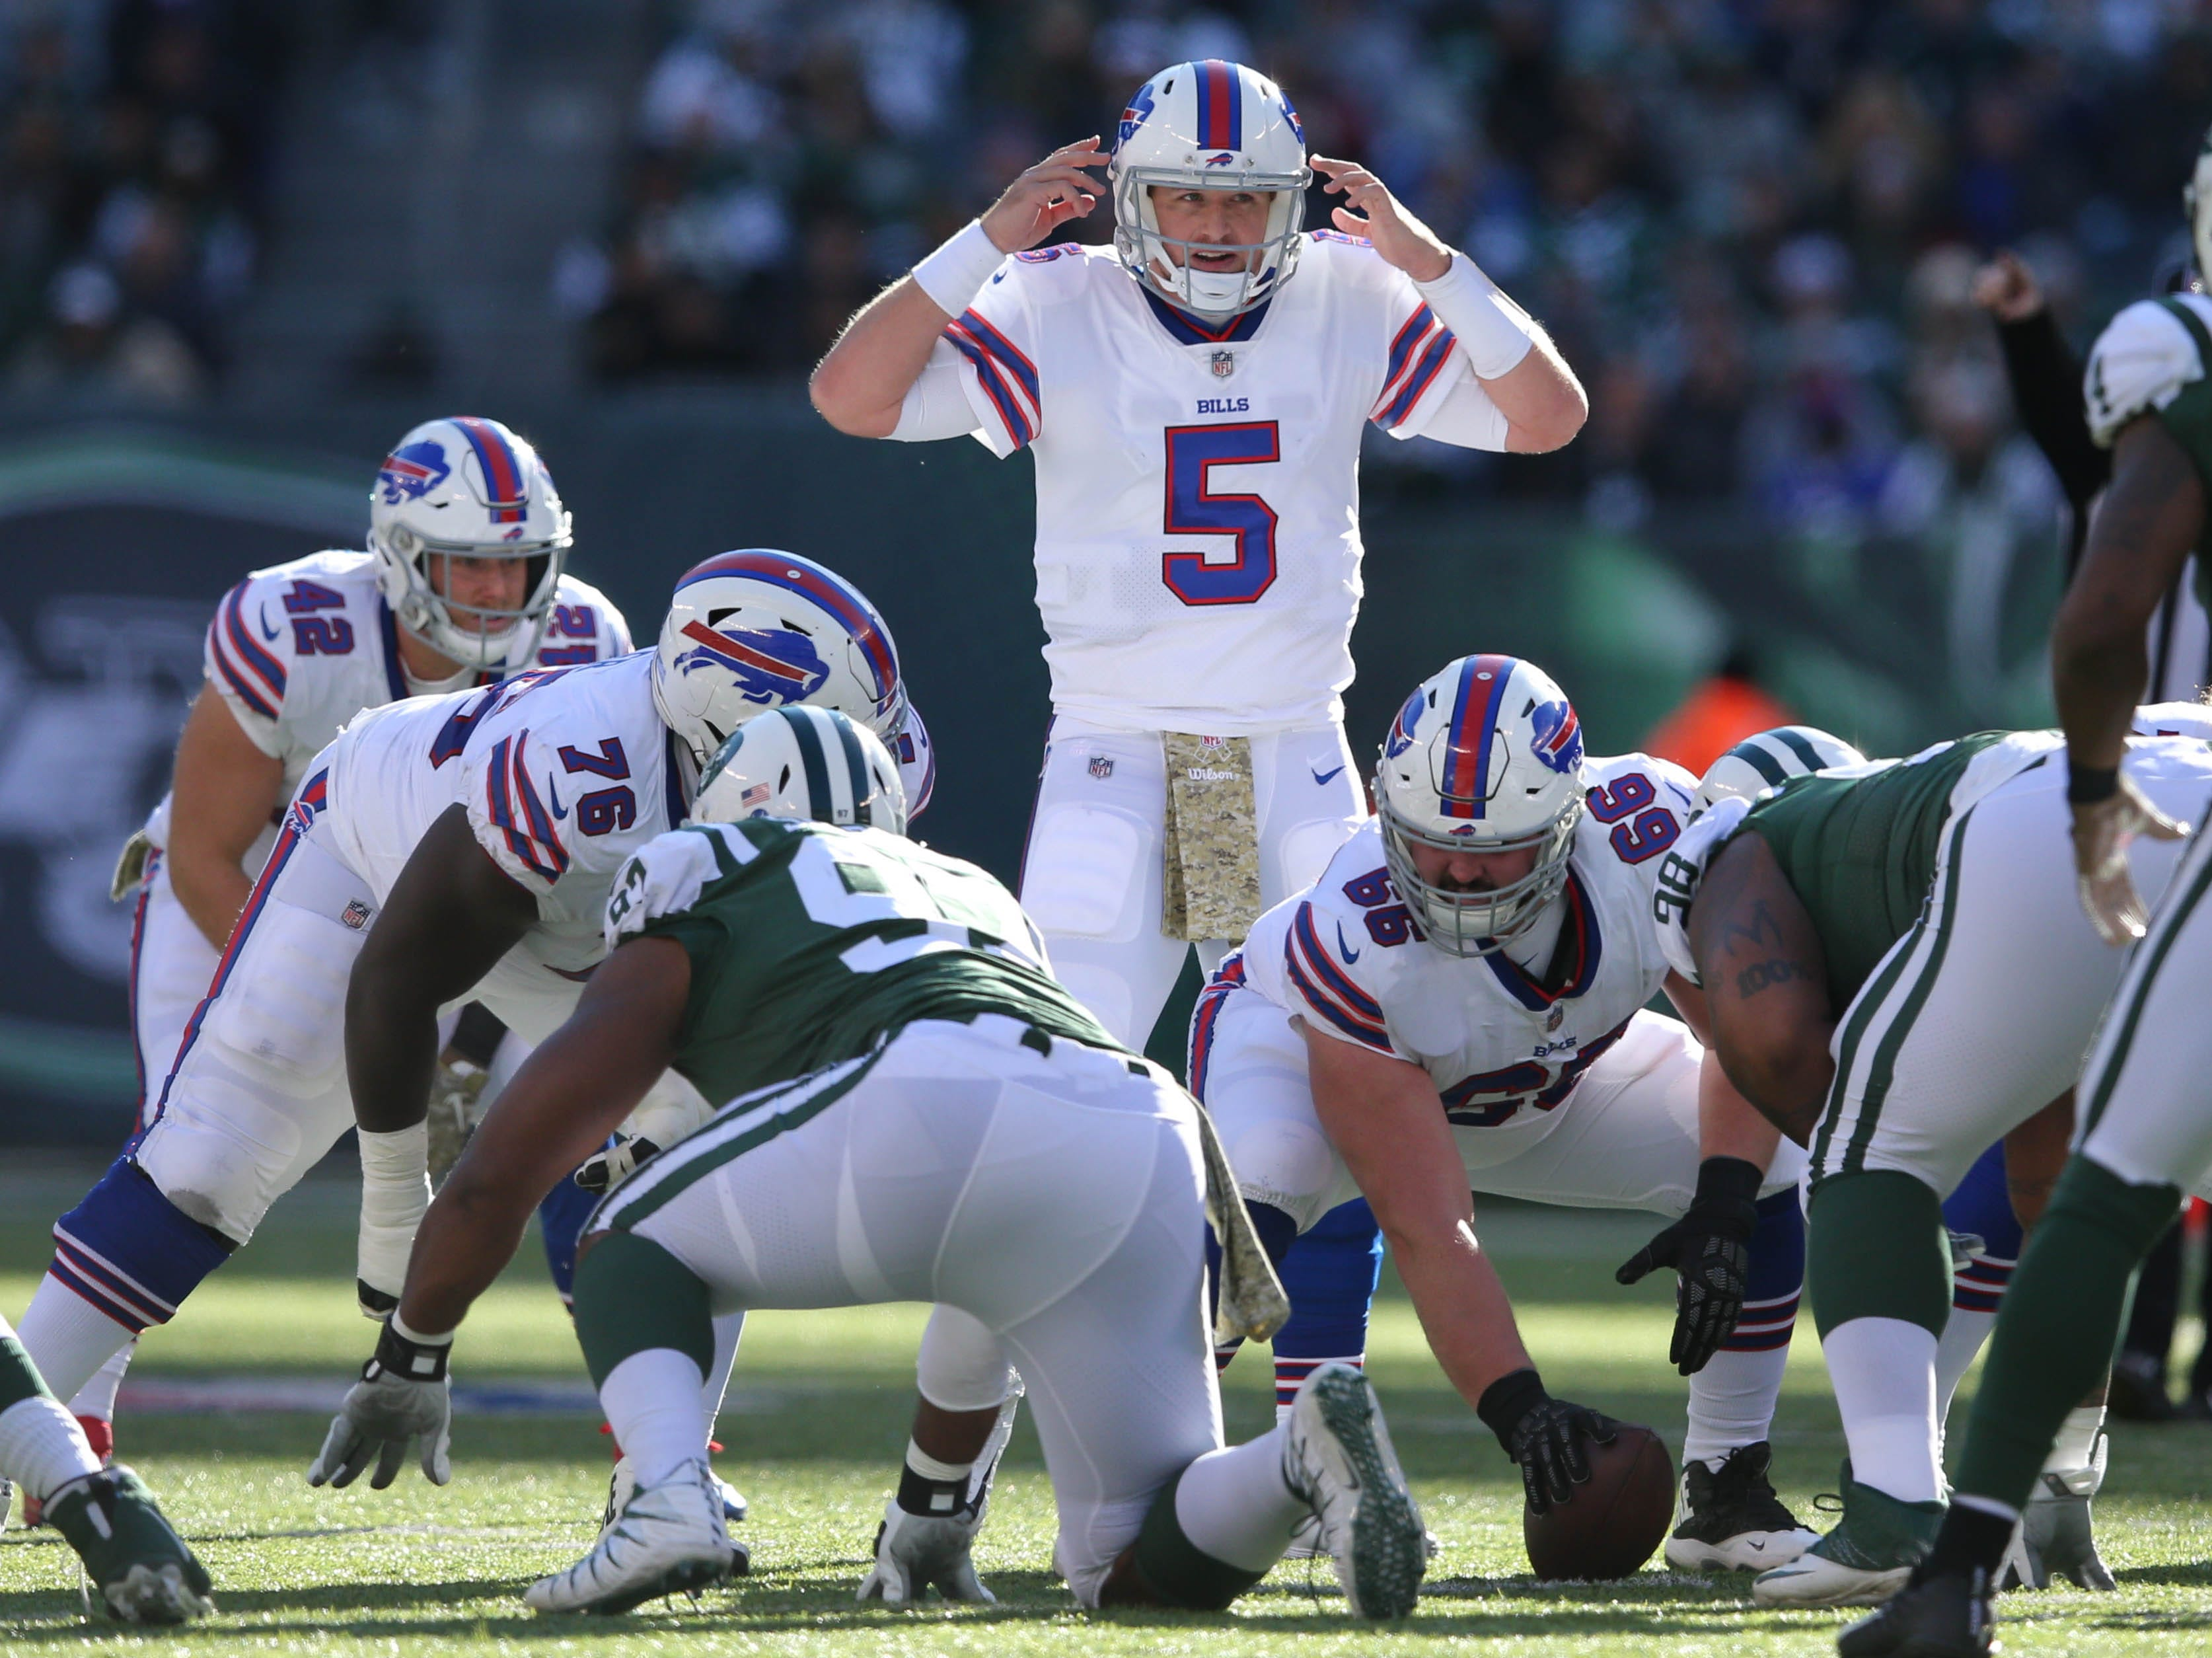 Nov 11, 2018; East Rutherford, NJ, USA; Buffalo Bills quarterback Matt Barkley (5) calls a play against the New York Jets during the second quarter at MetLife Stadium. Mandatory Credit: Brad Penner-USA TODAY Sports